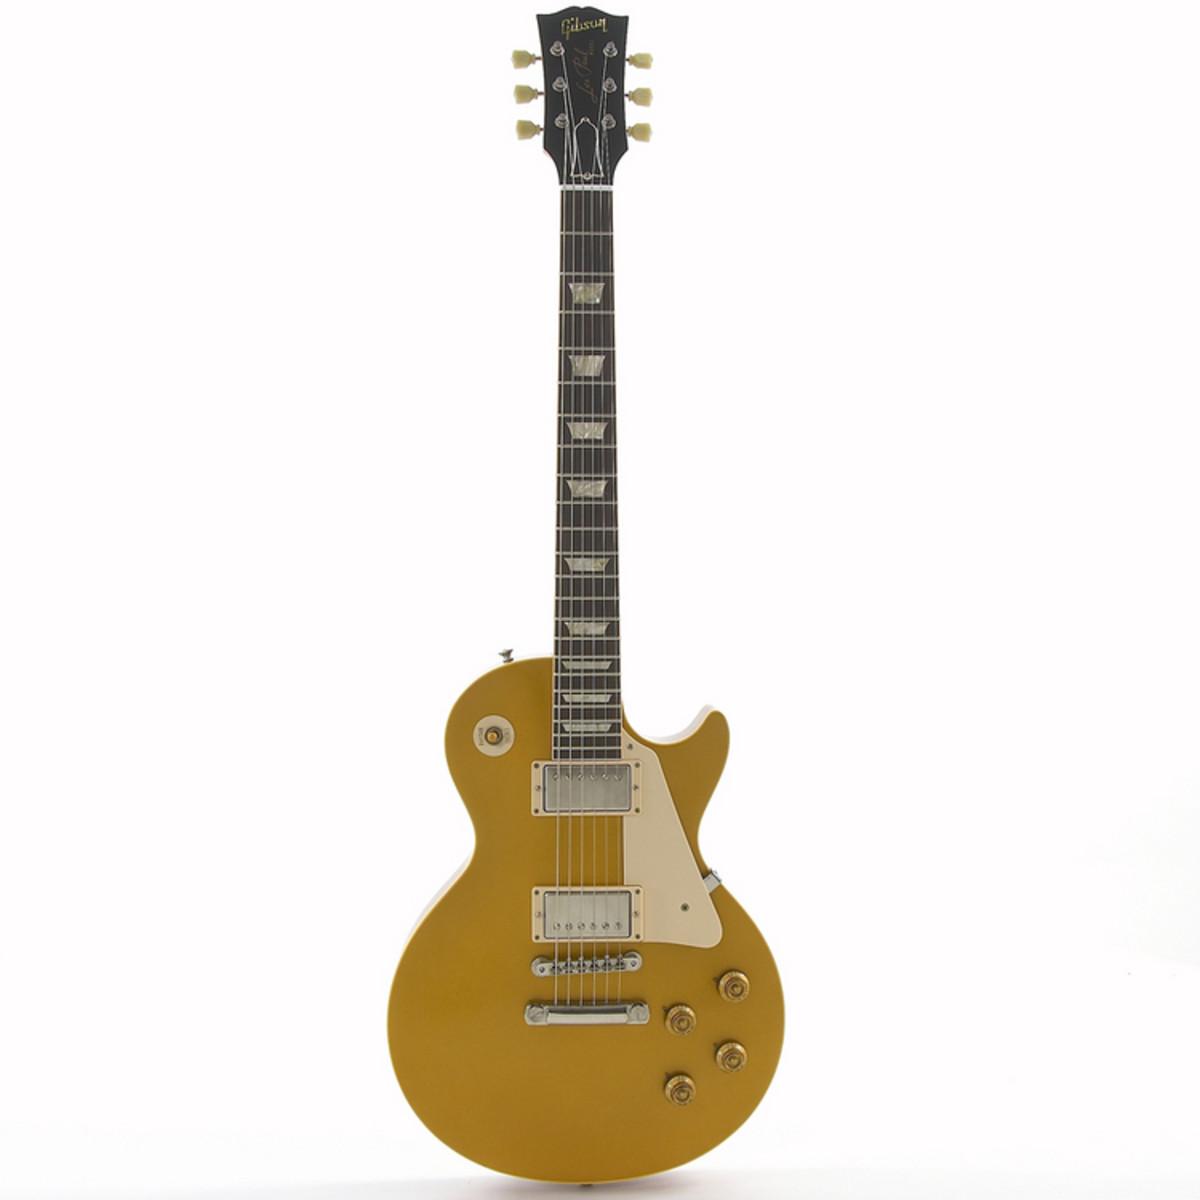 gibson les paul 1957 goldtop vos electric guitar at gear4music. Black Bedroom Furniture Sets. Home Design Ideas